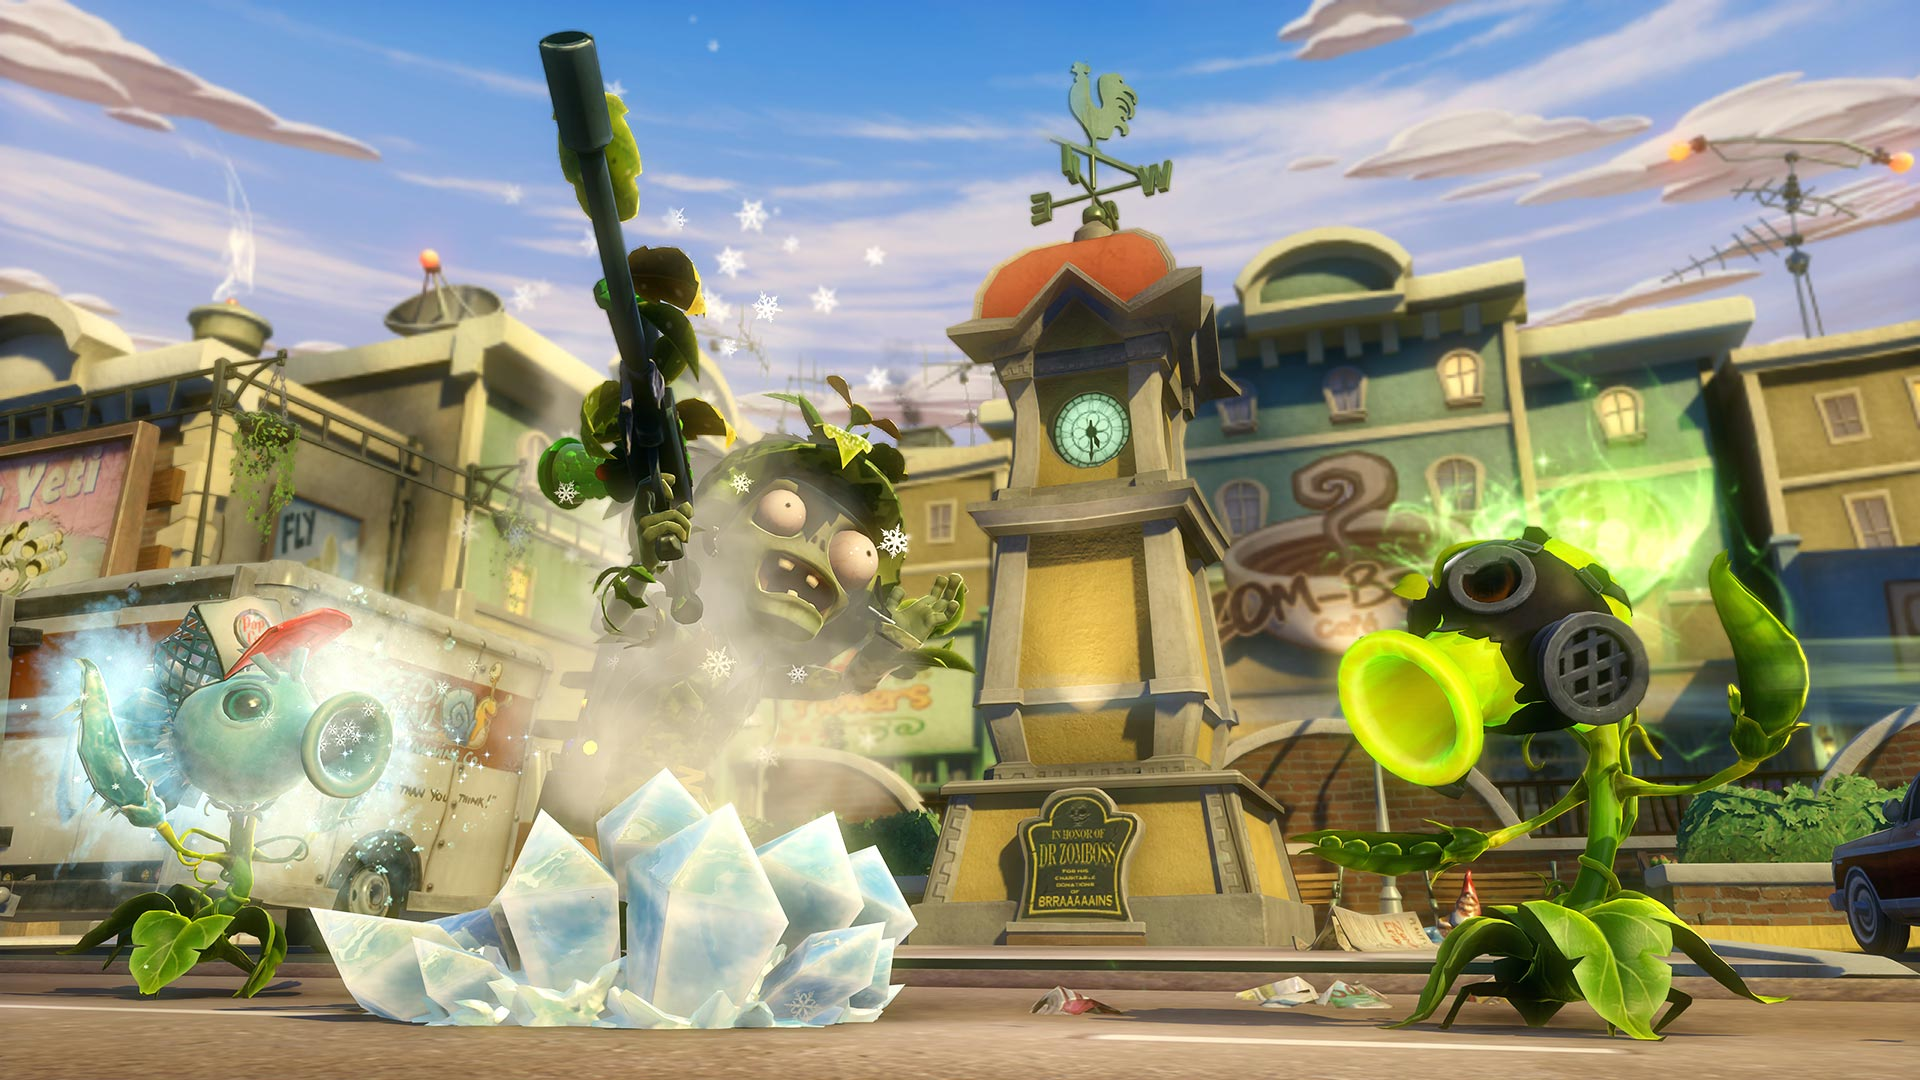 Plants vs Zombies Garden Warfare on PS4 – Plants Vs Zombies Garden